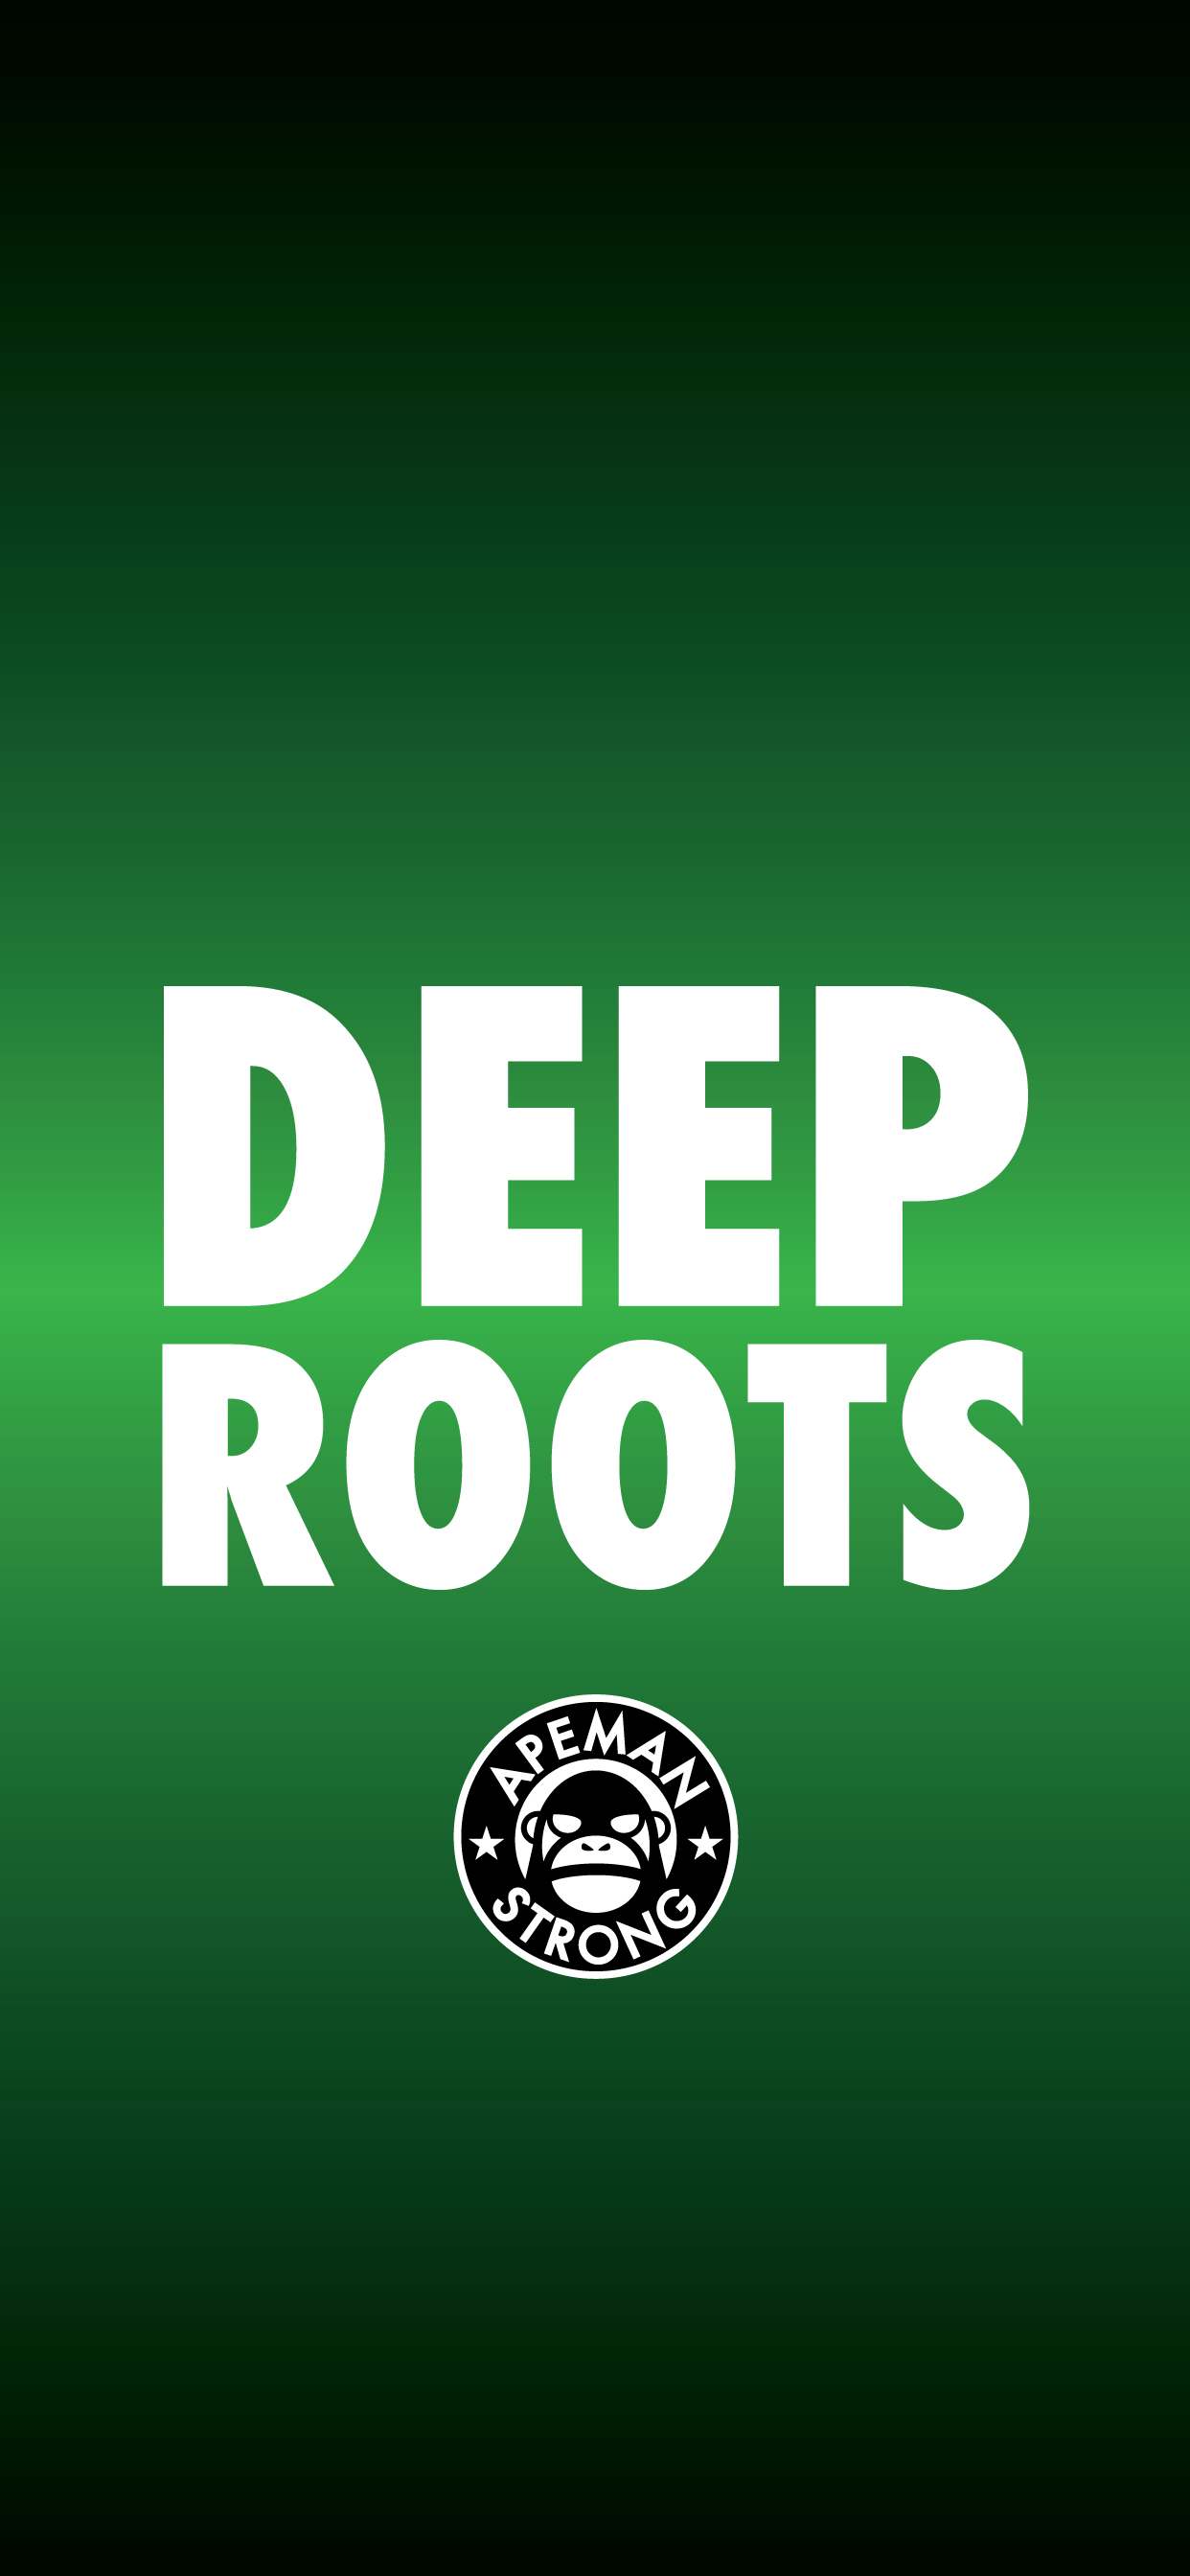 DEEP-ROOTS.jpg